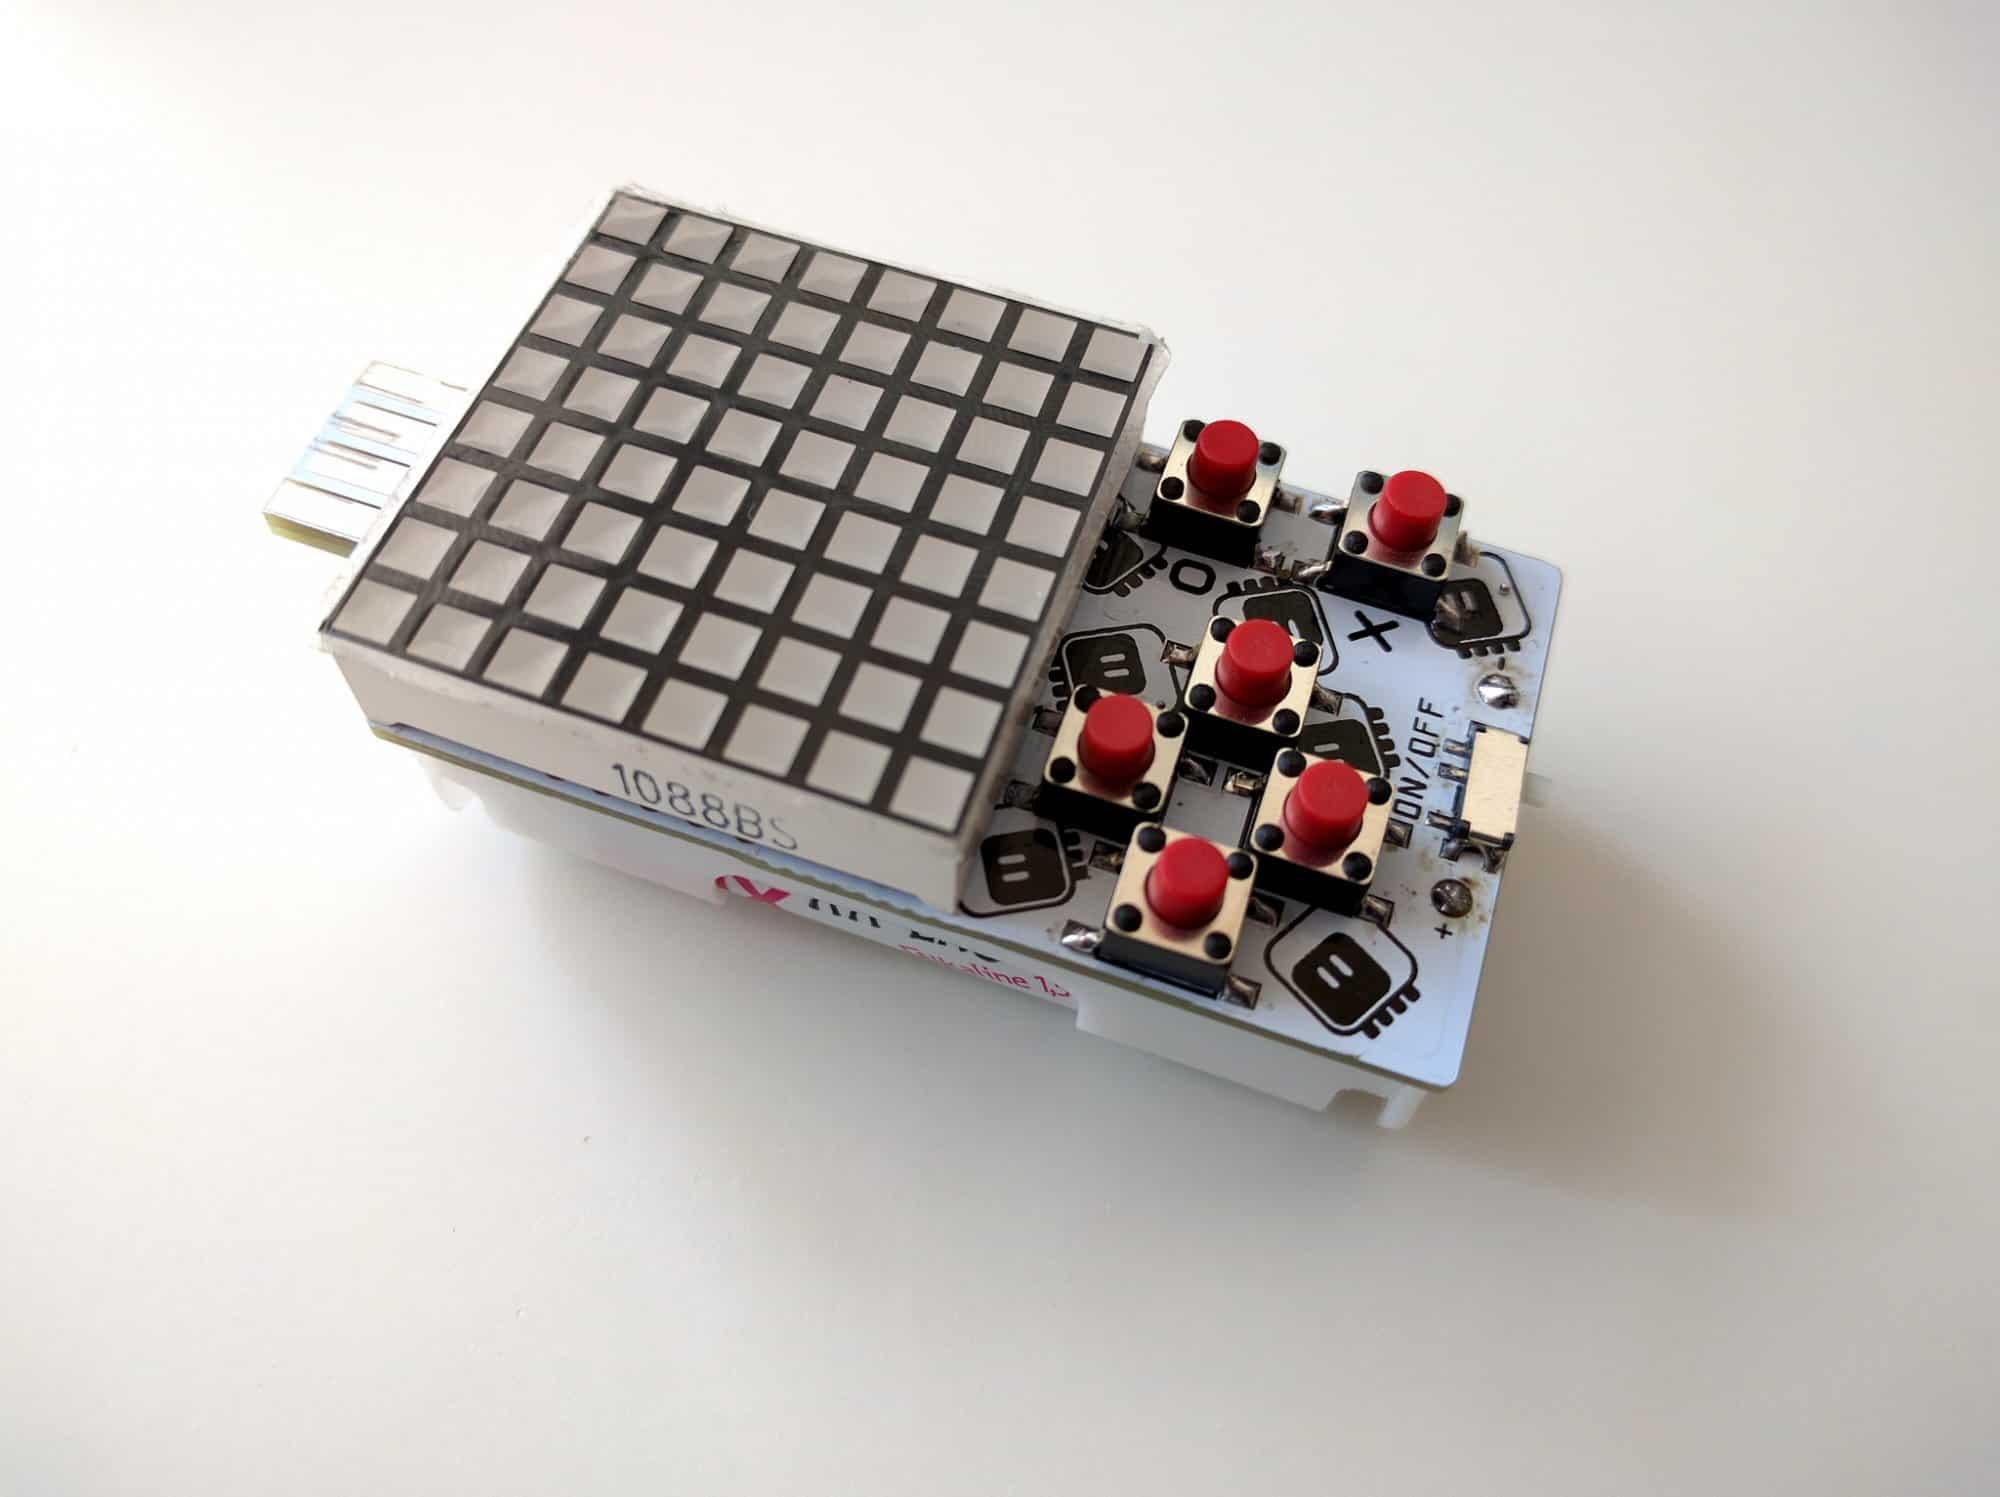 Miniaturowa konsola do nauki programowania gier